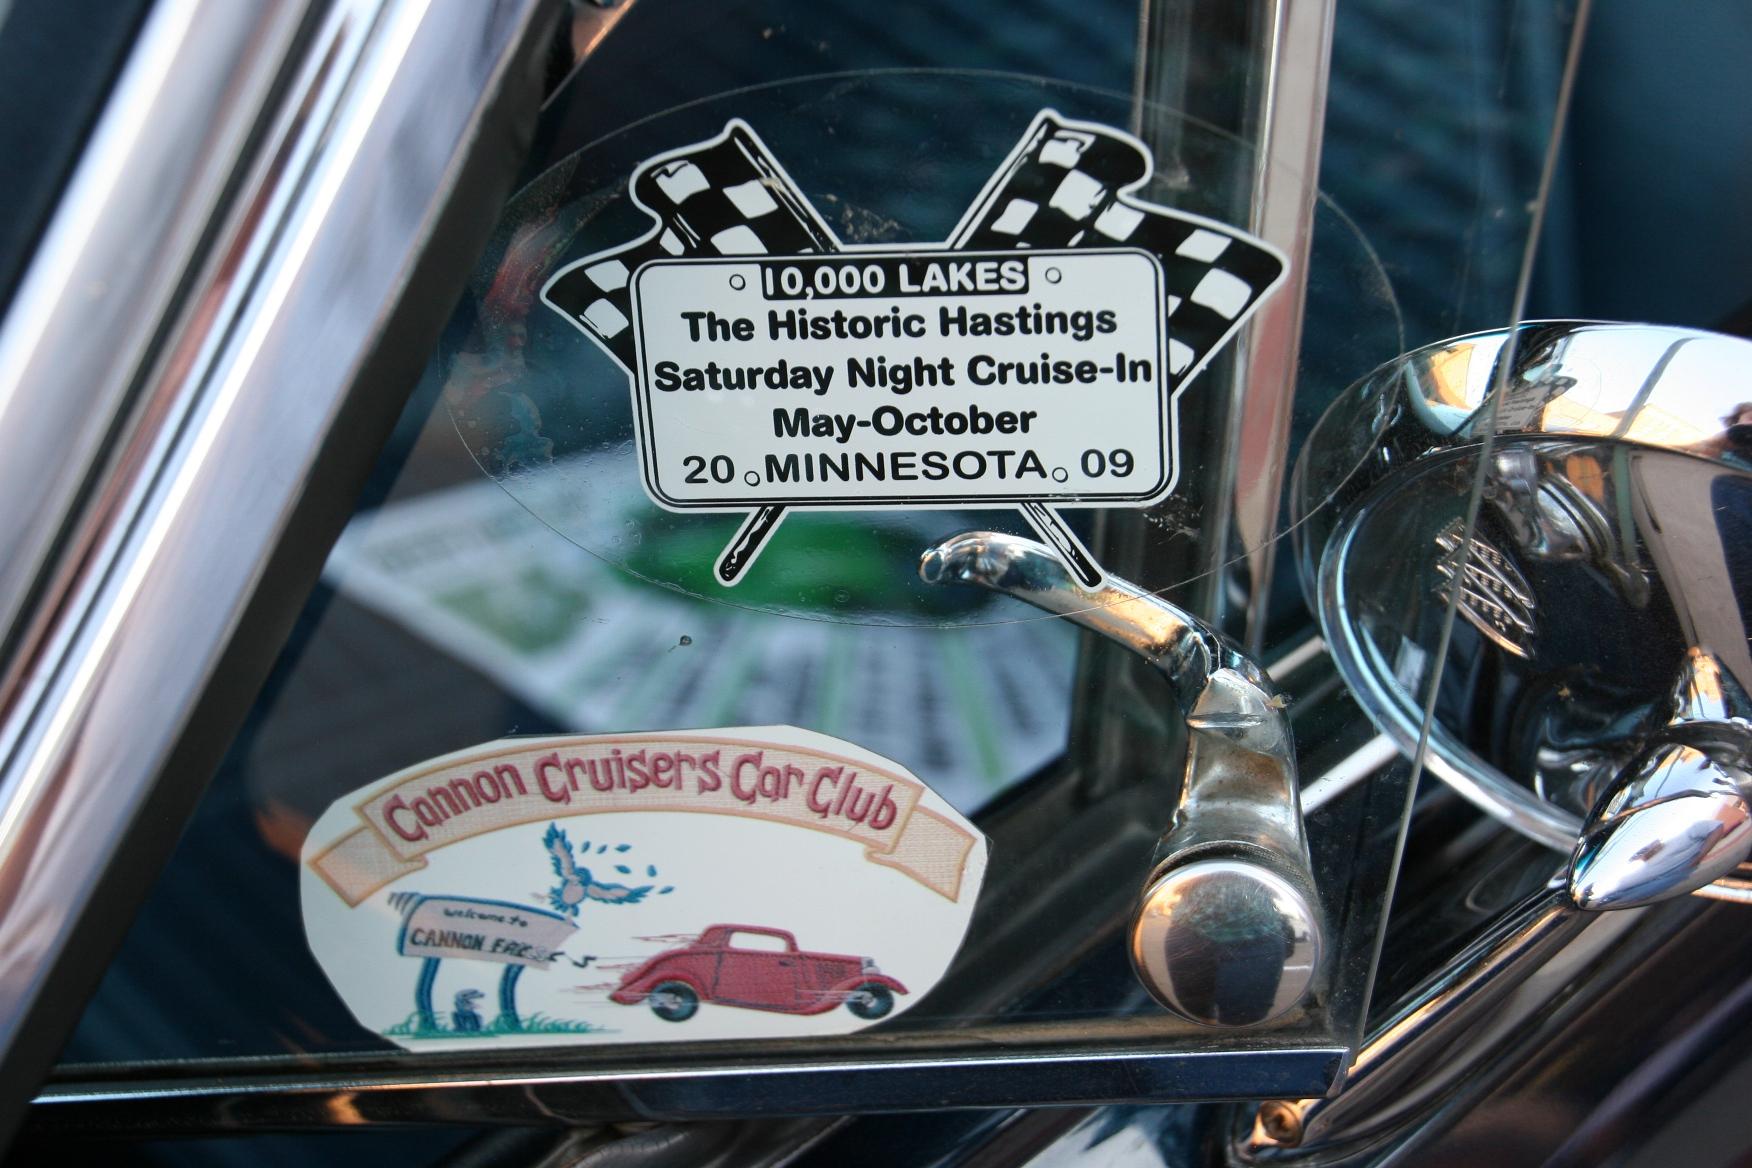 Car Show Car Cruise Stickers Minnesota Prairie Roots - Car show stickers